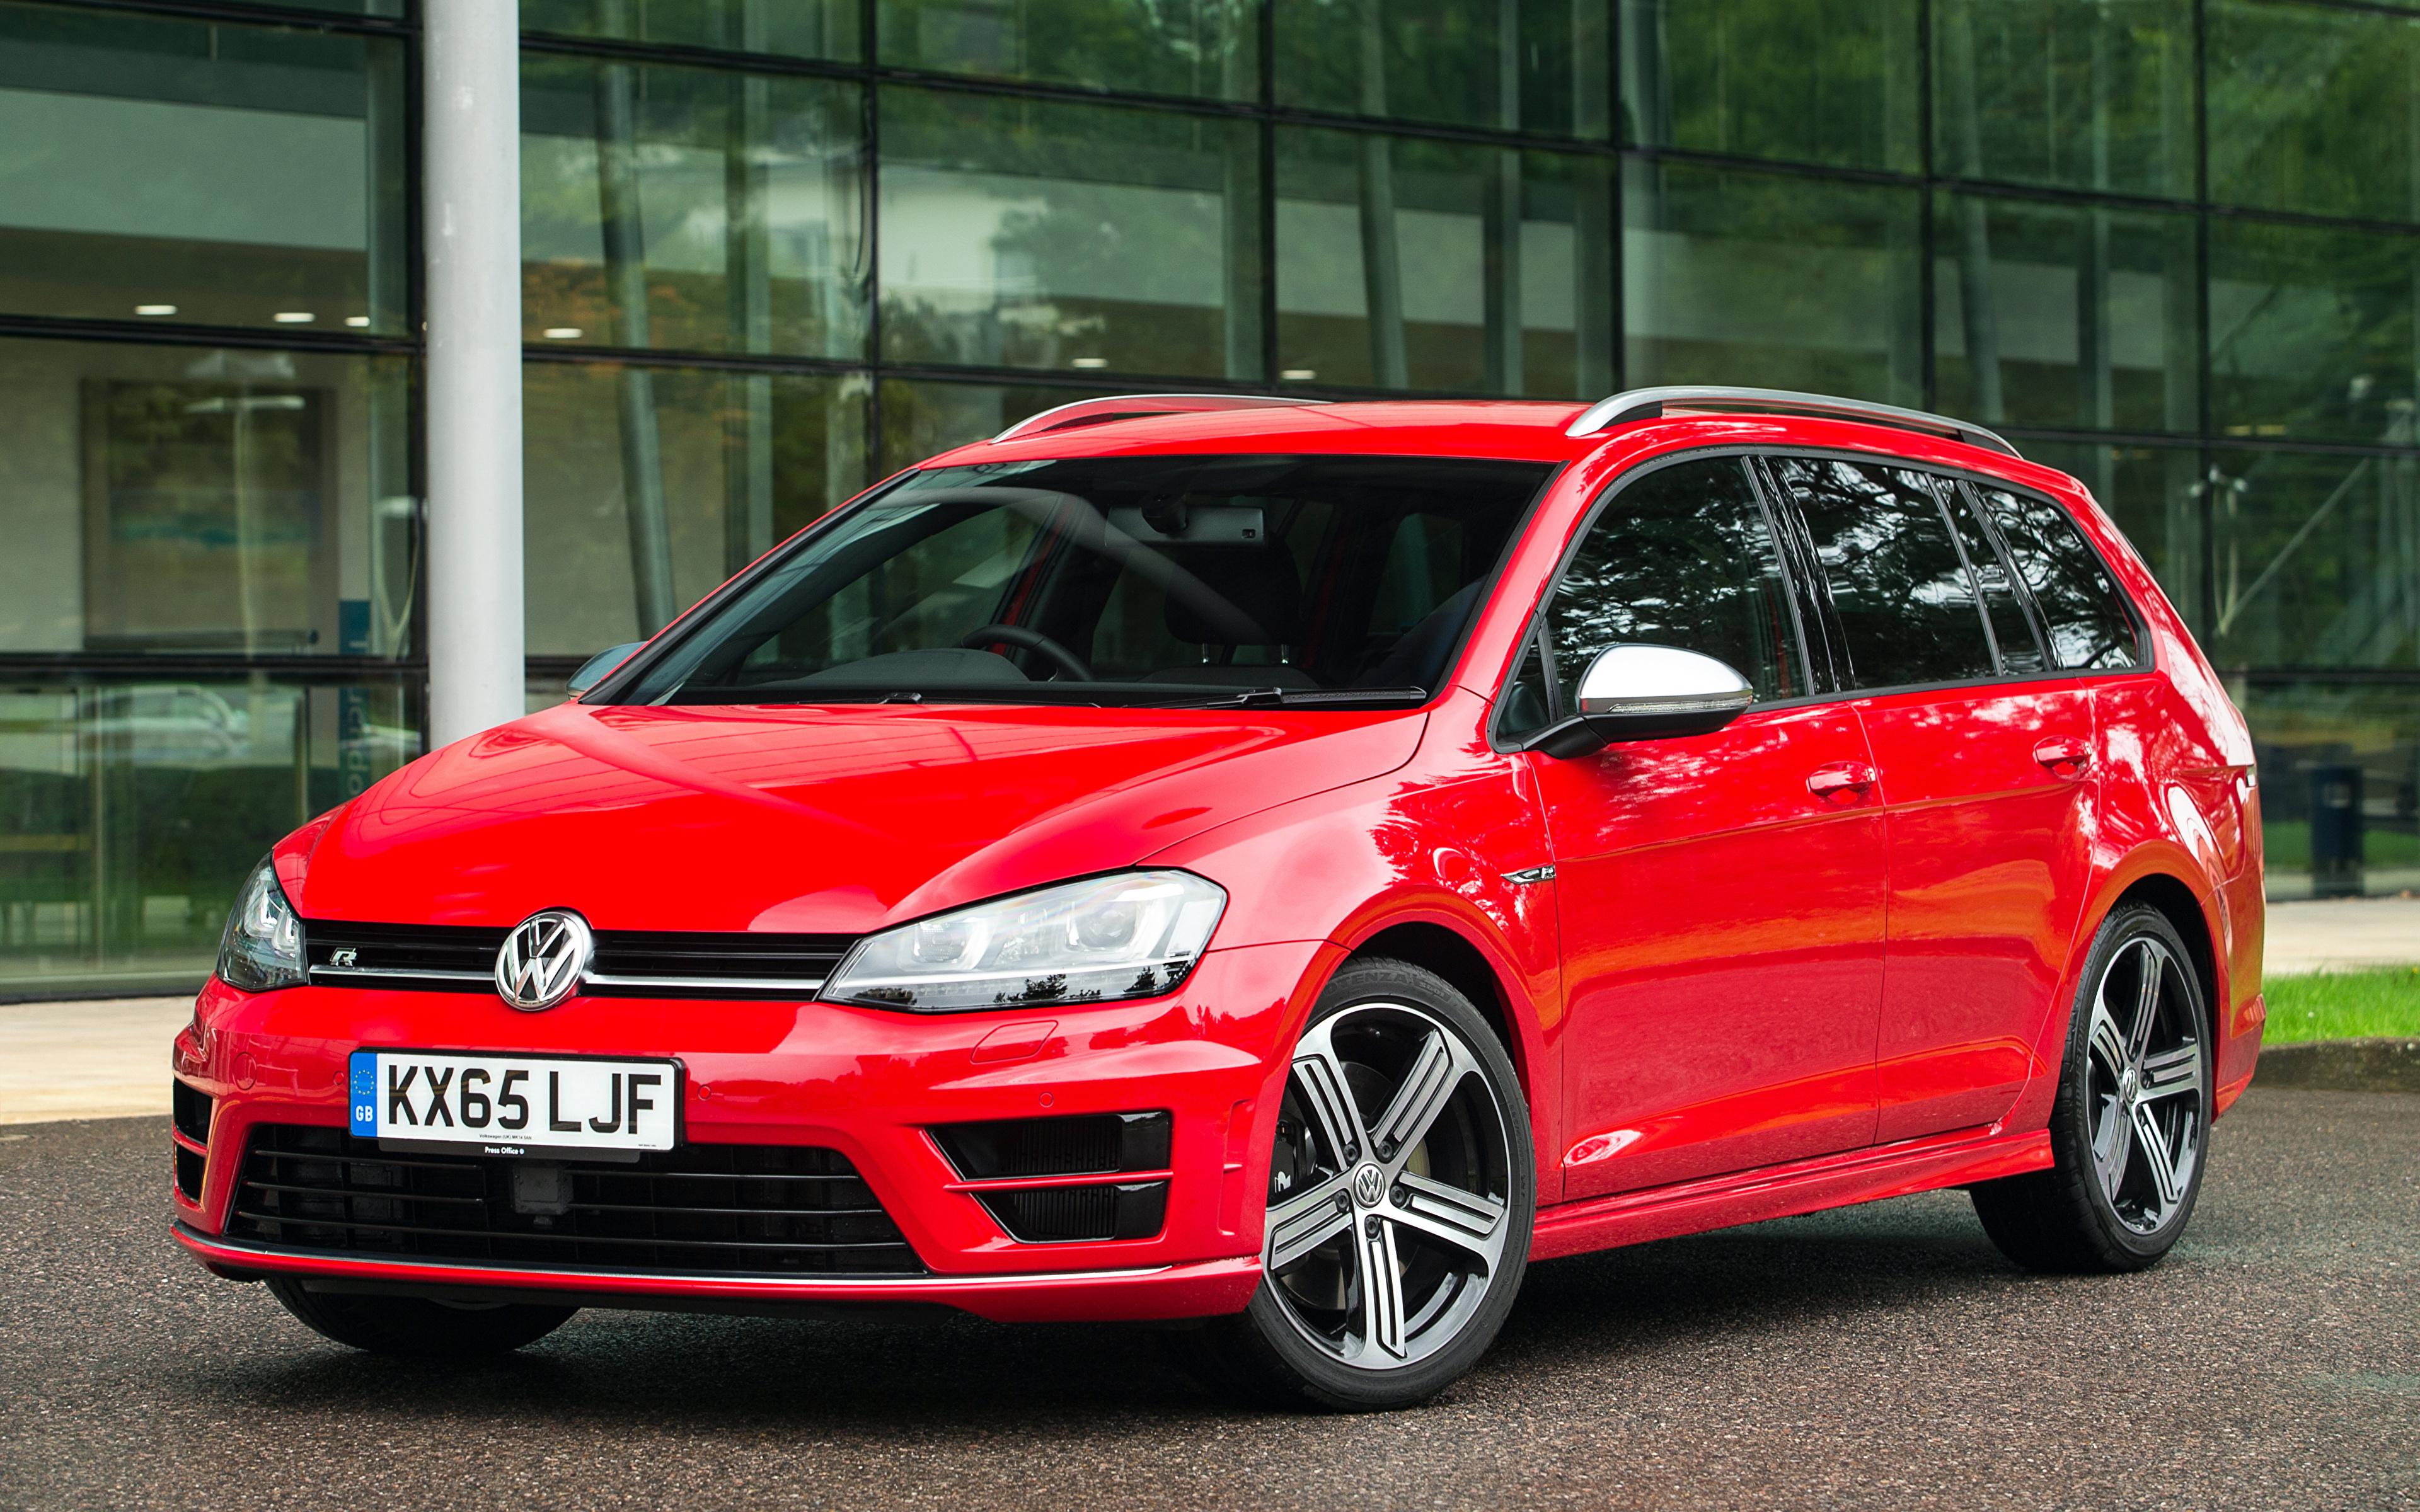 Picture Volkswagen 2015 Golf Vii R Estate Red Cars 3840x2400